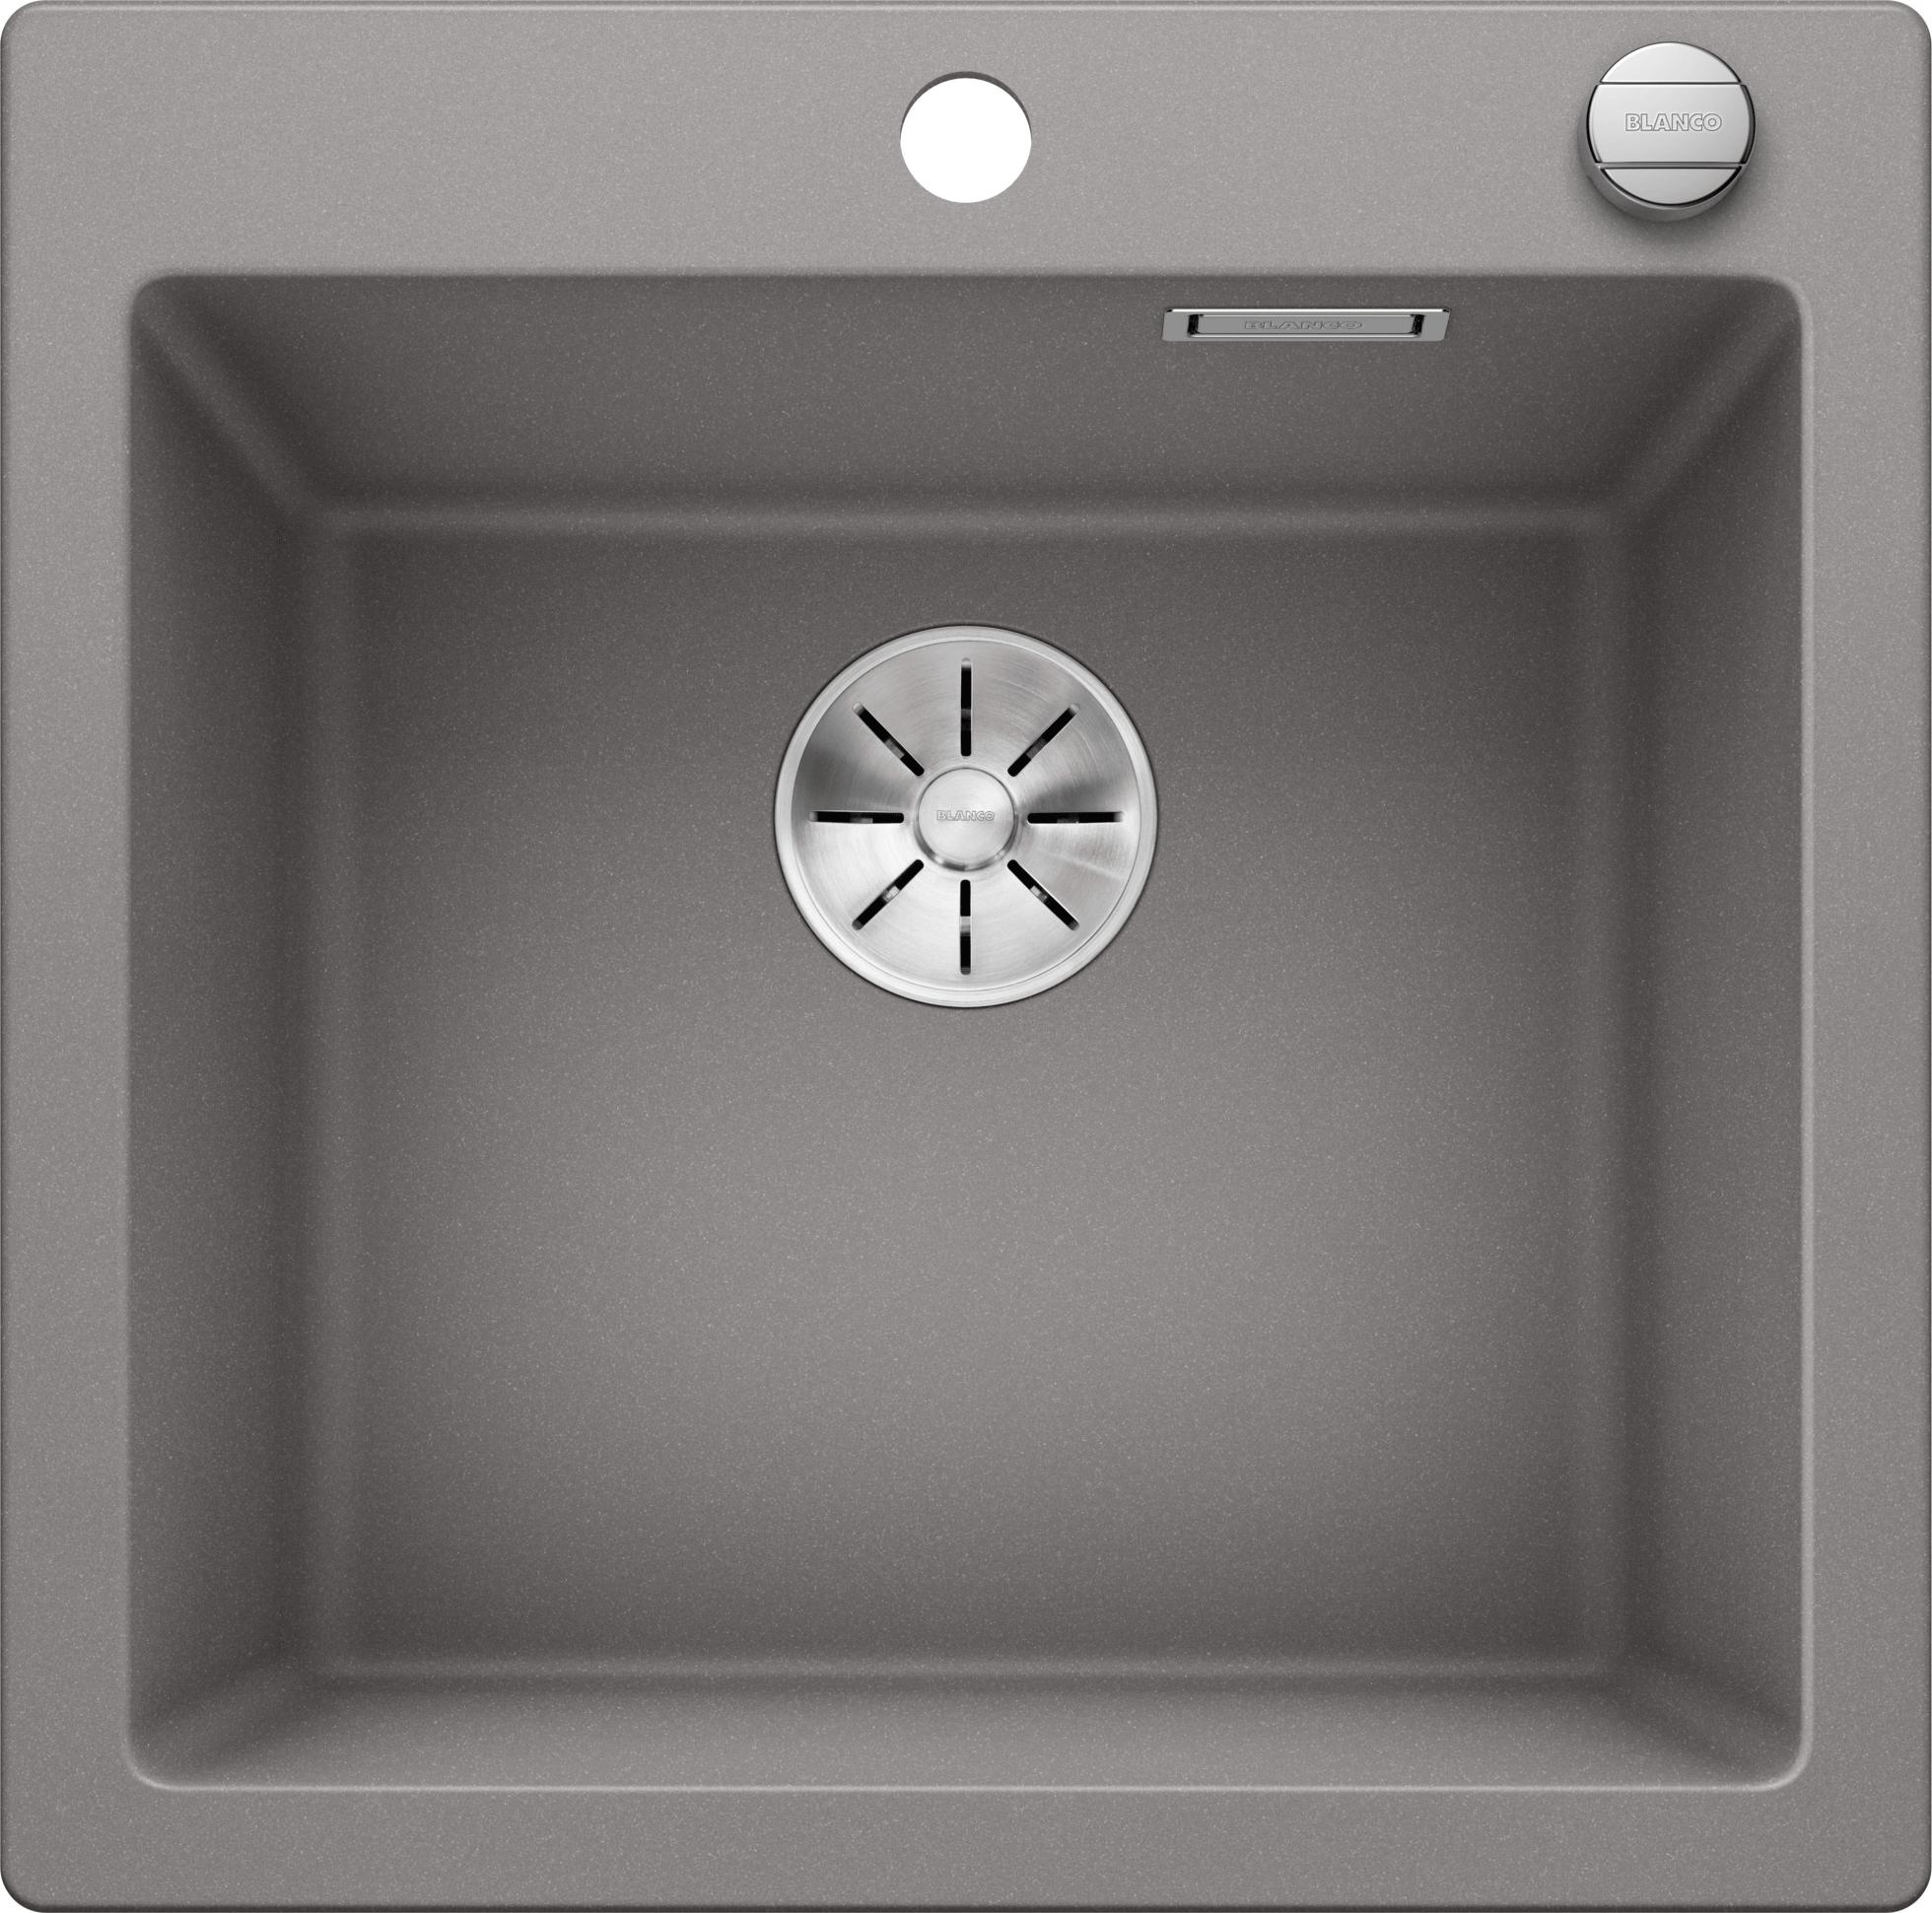 Blanco Pleon Spule 5 Silgranit Puradur Mit Ablauffernbedienung Alumetallic